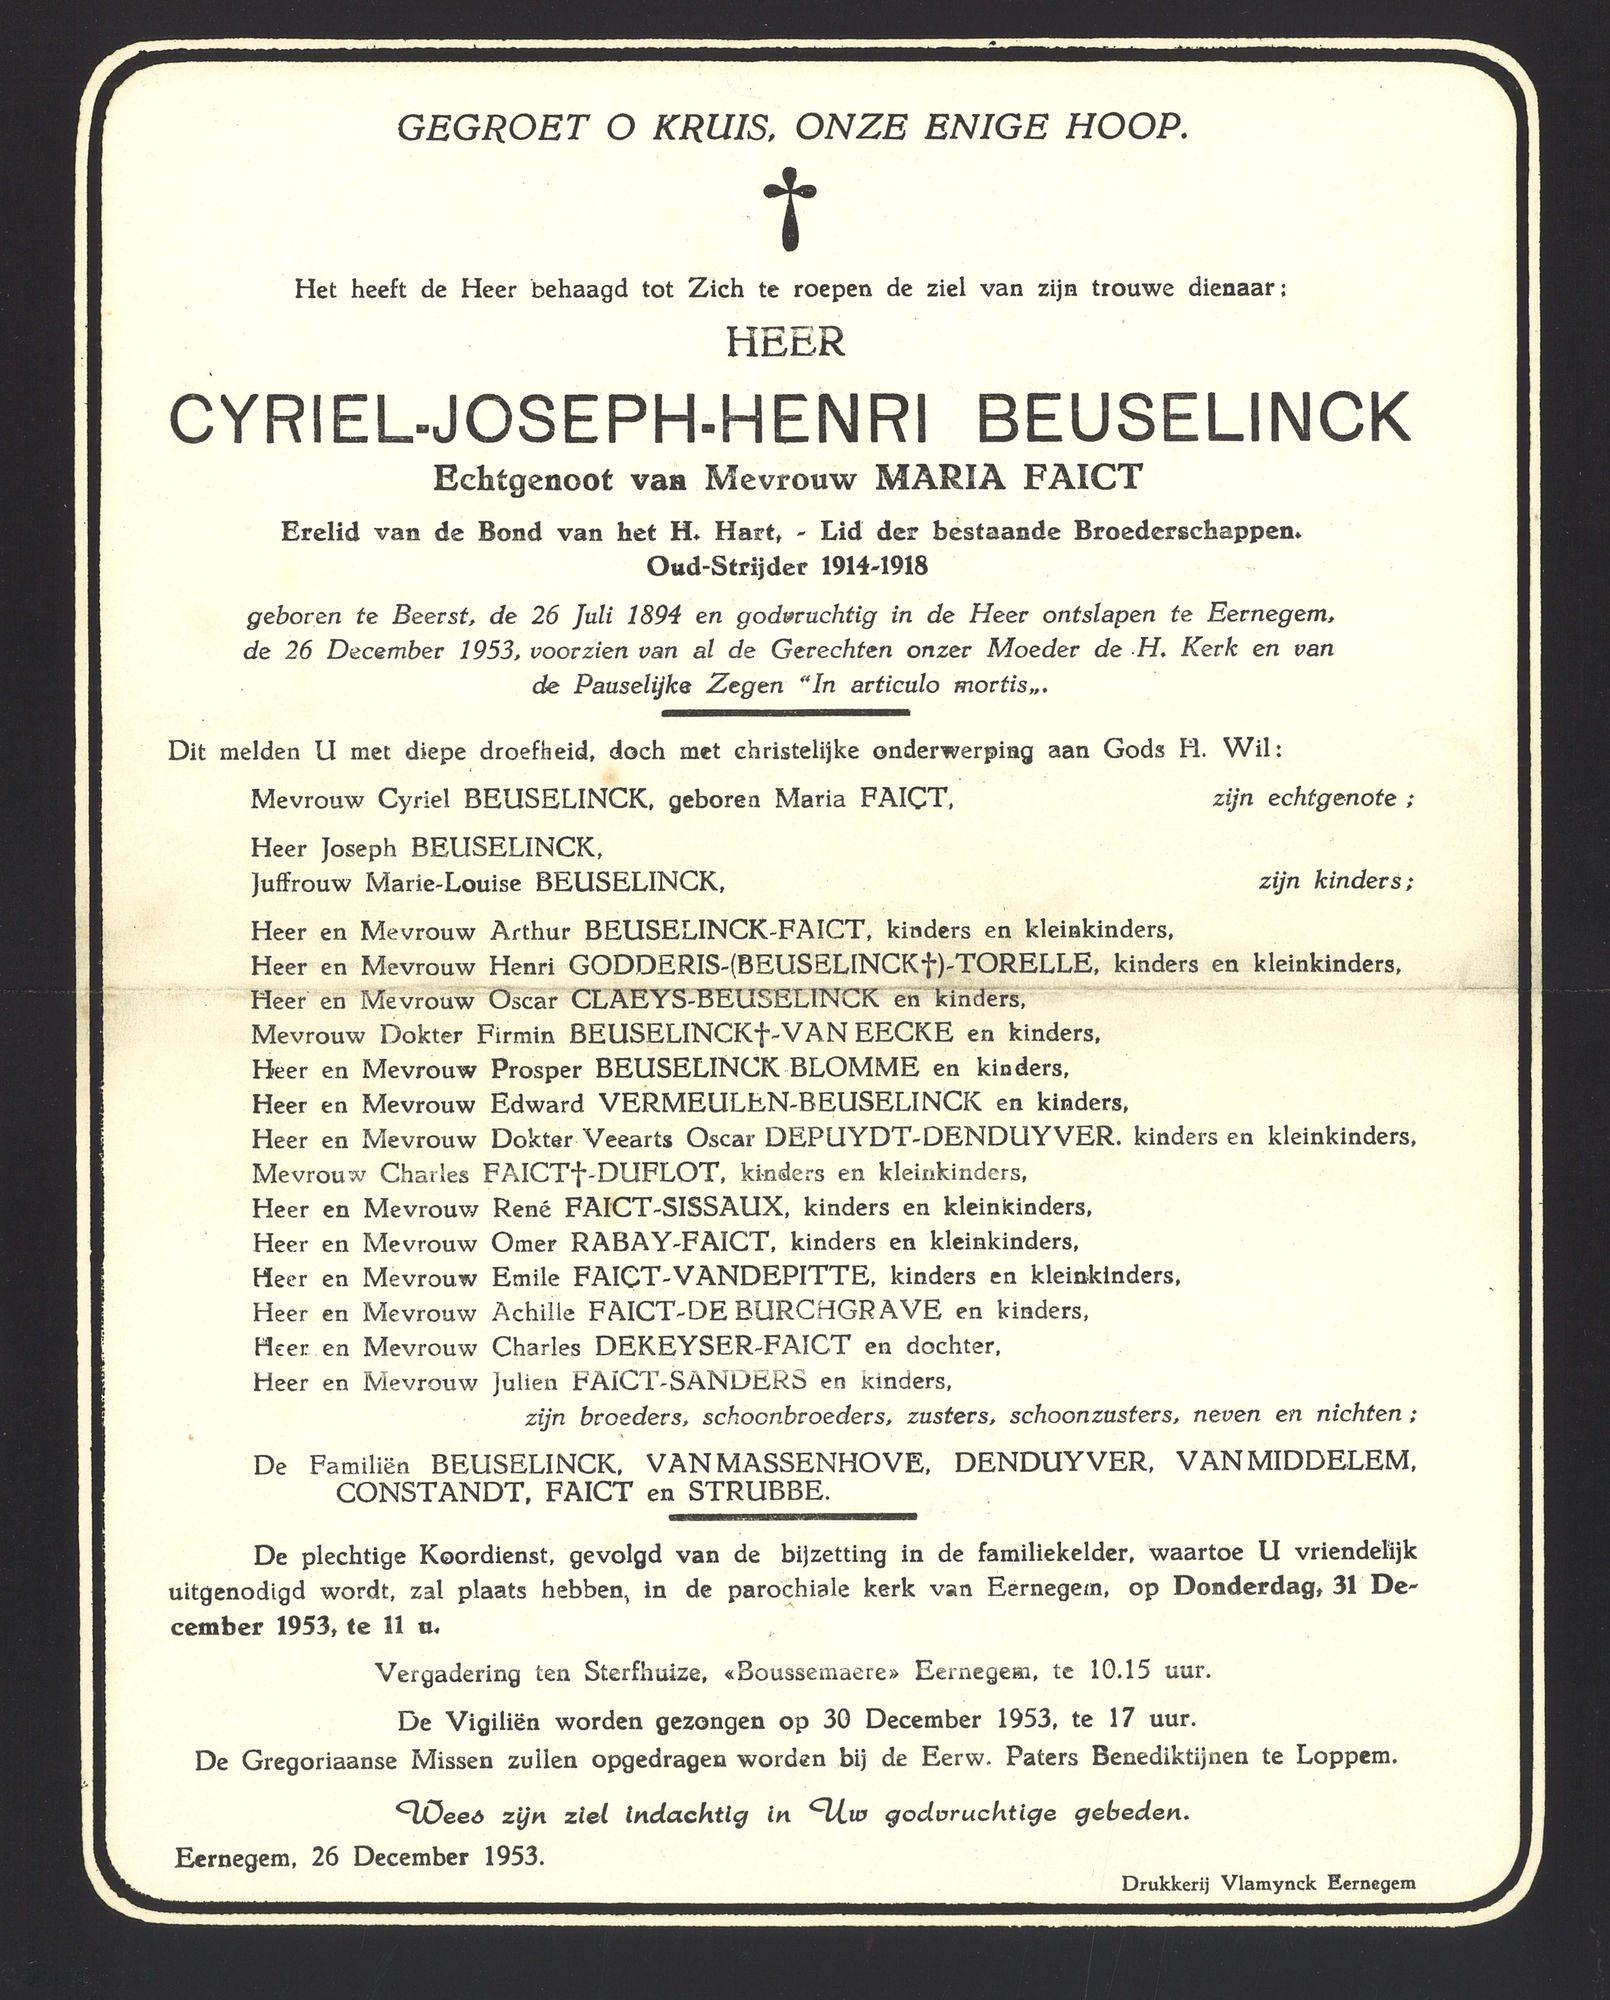 Beuselinck Cyriel-Joseph-Henri